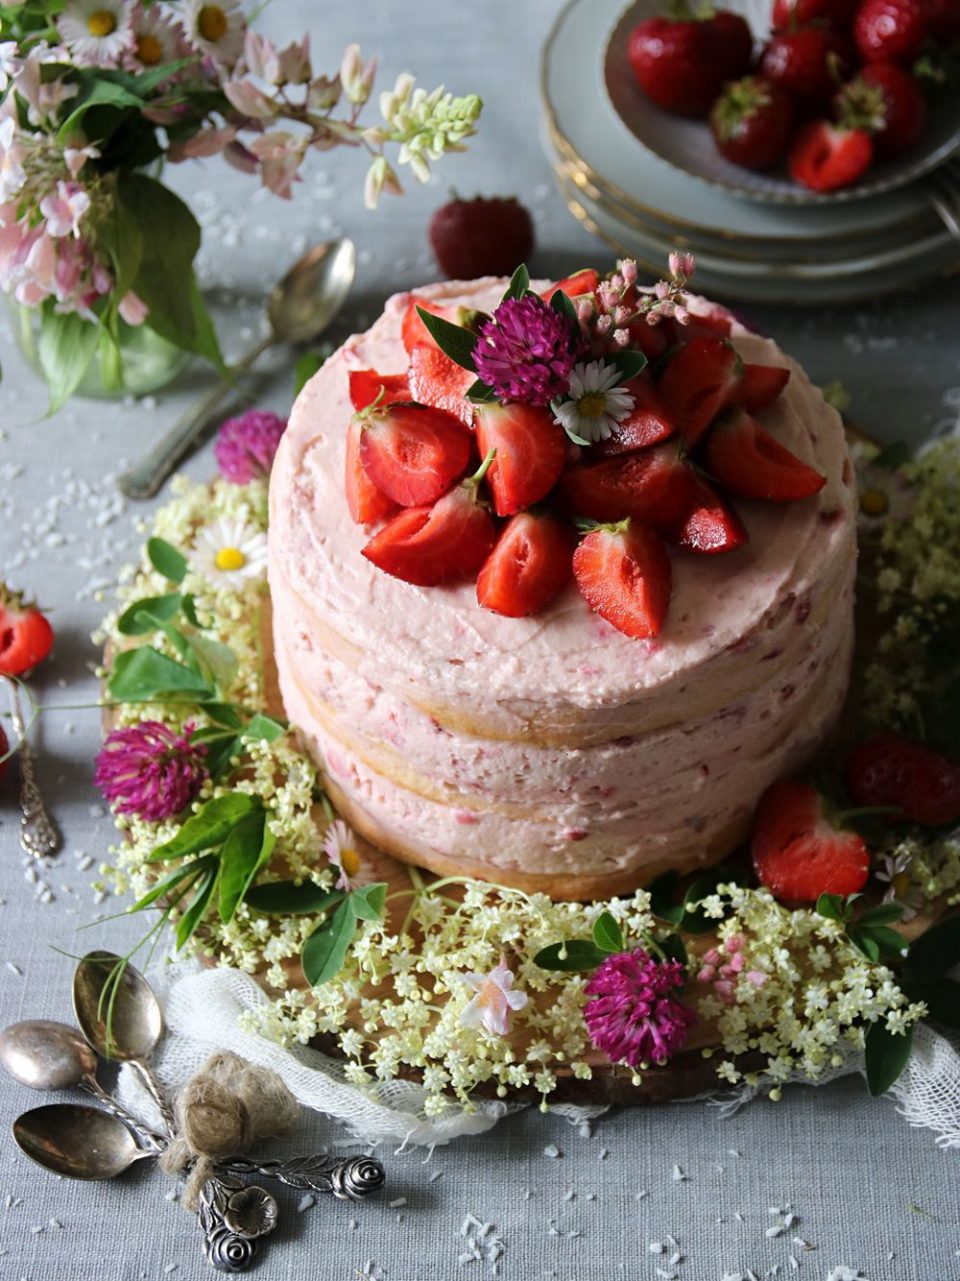 rustik jordgubbstårta